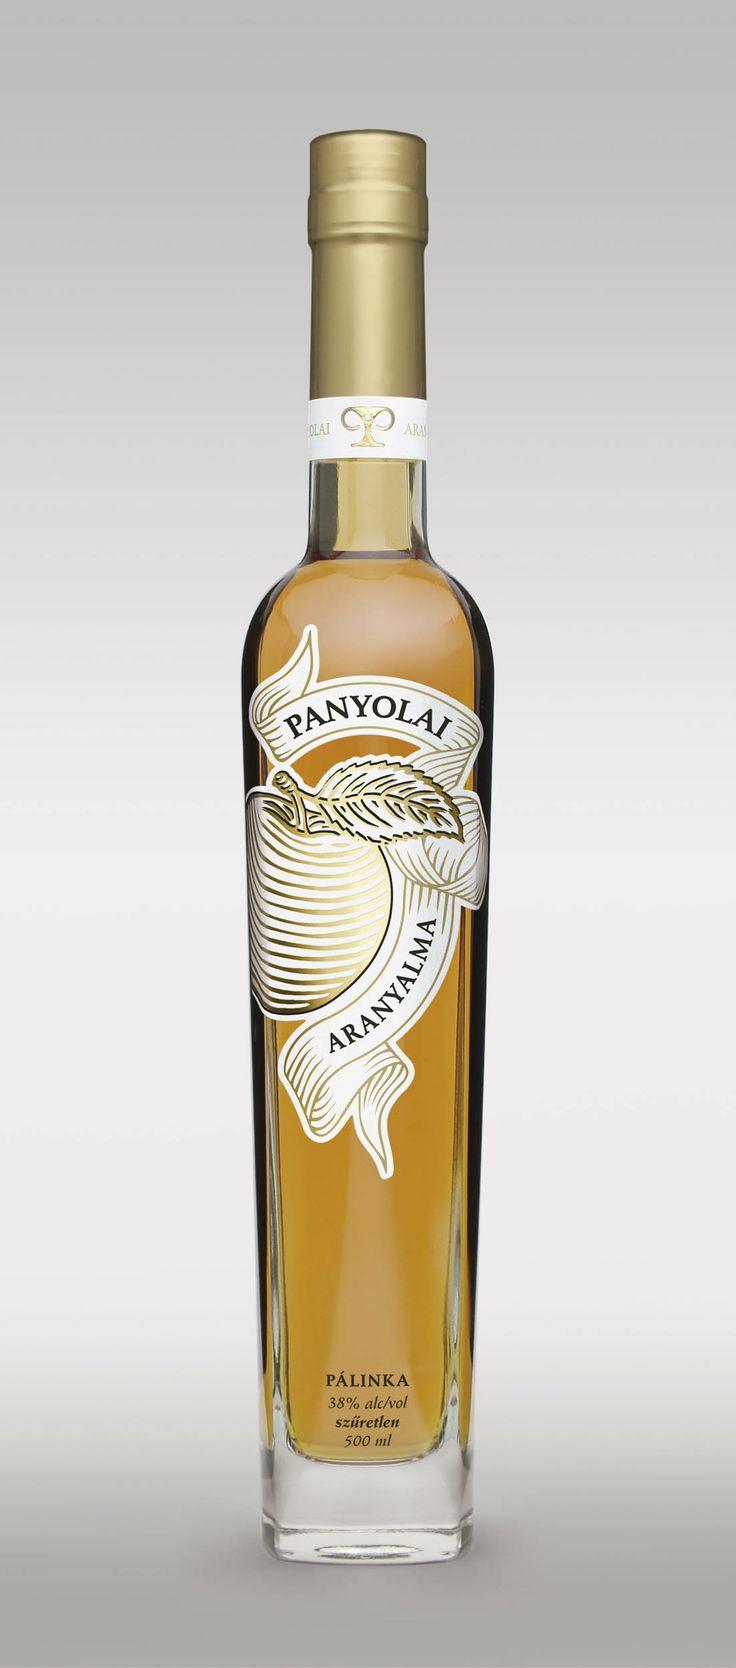 Panyolai Aranyalma Pálinka - #hungarian premium #schnapps